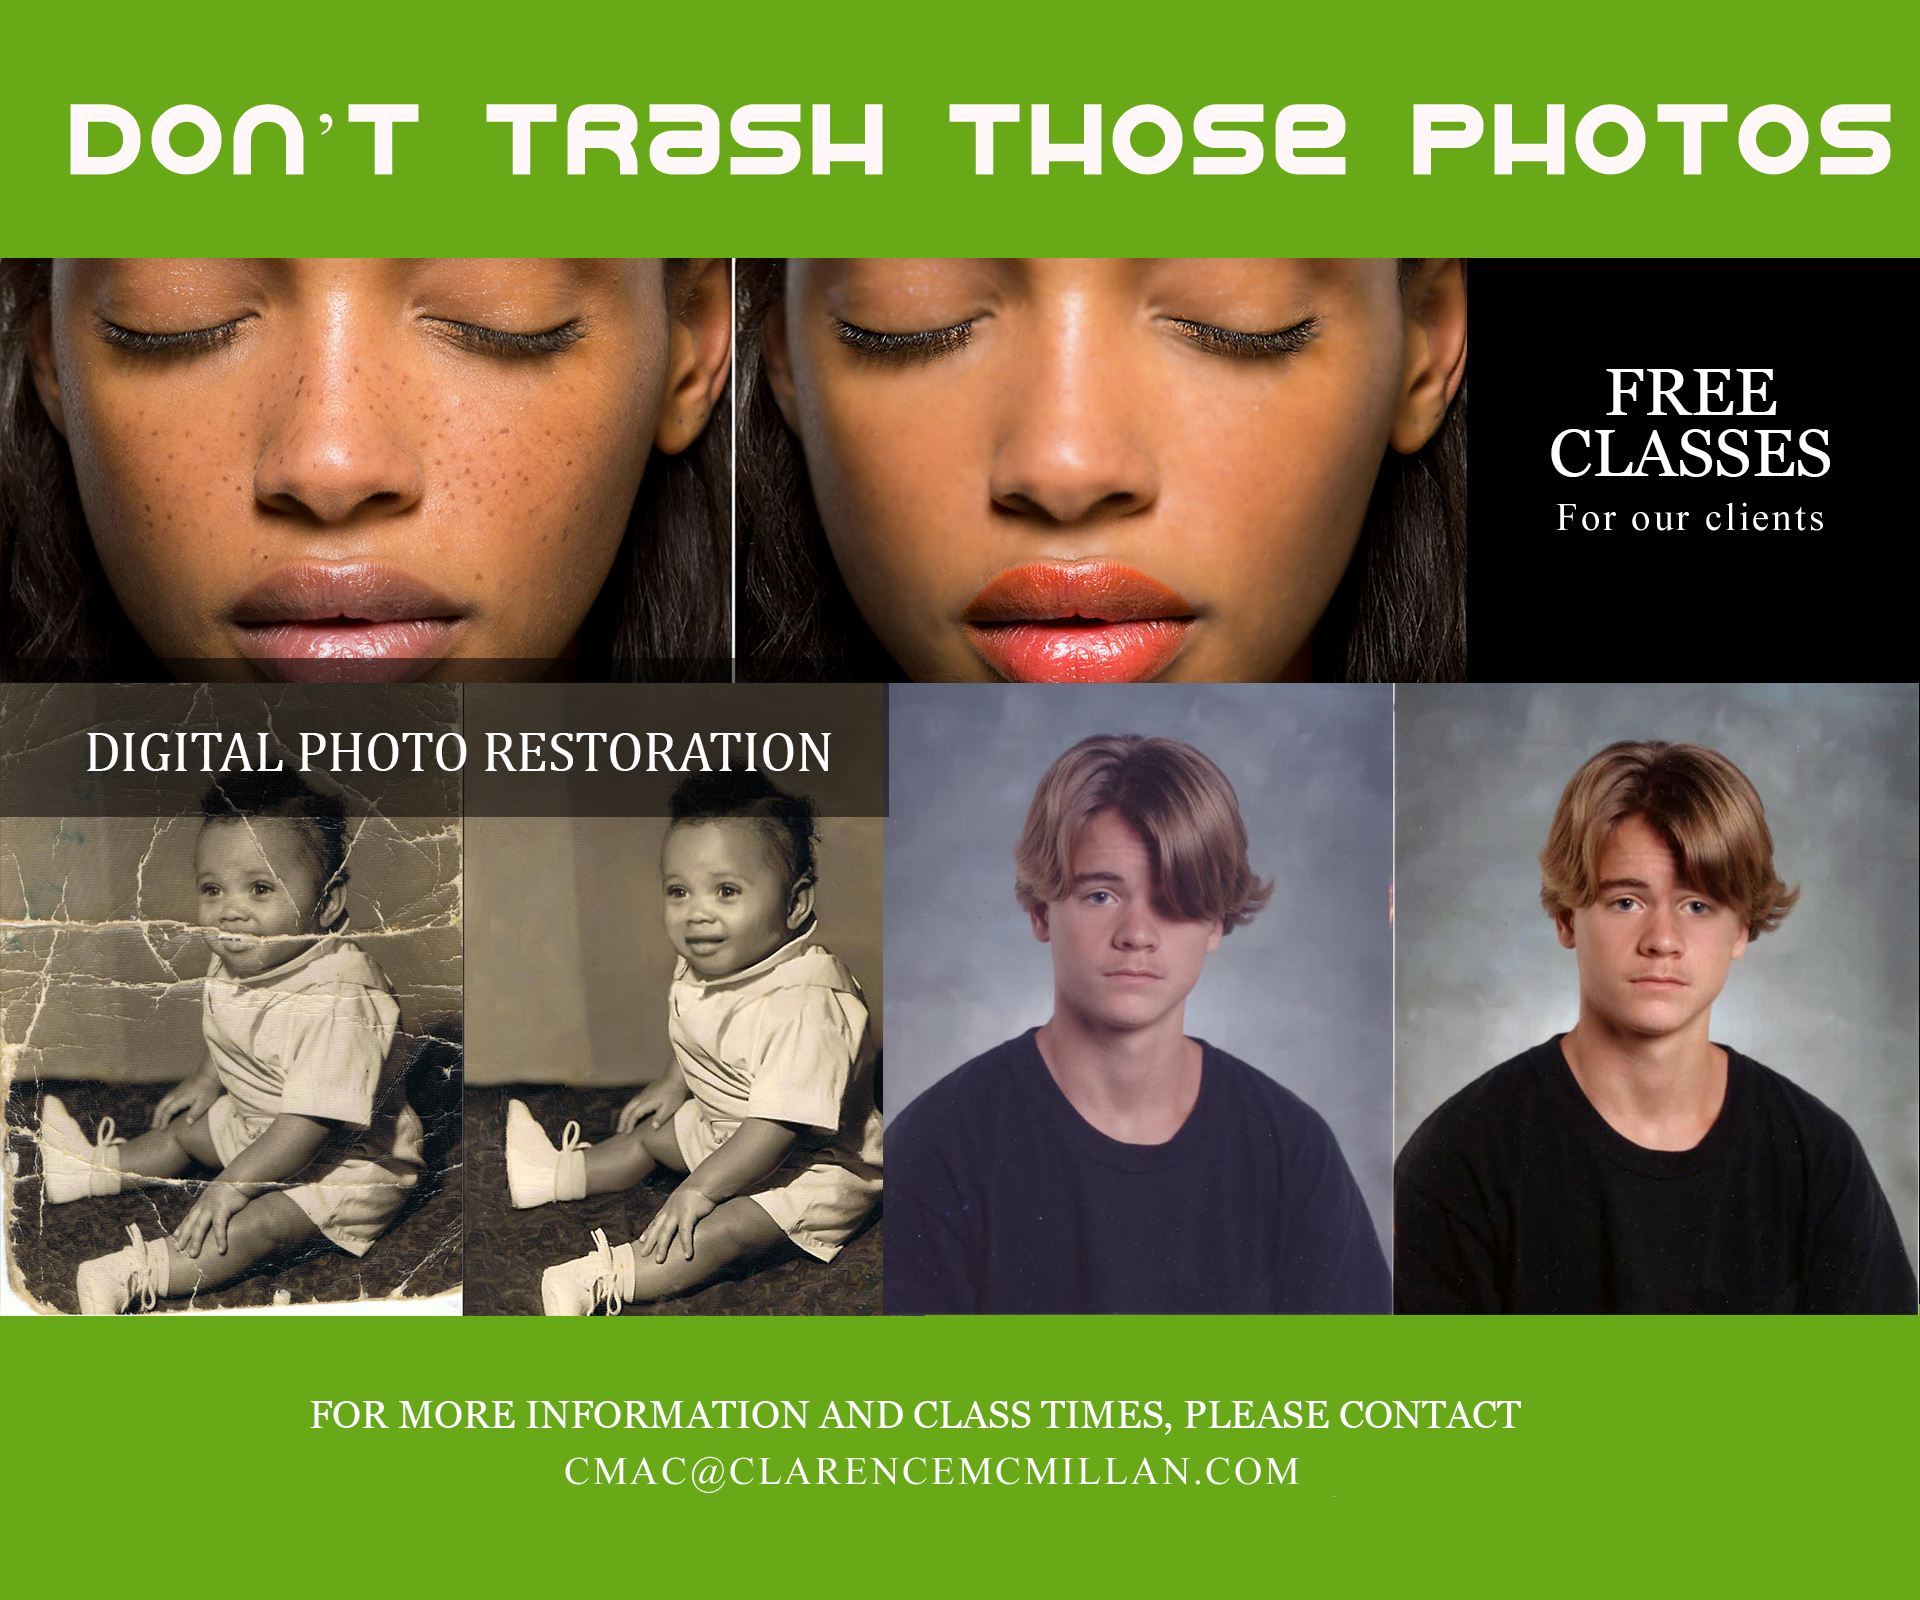 Photo Restoration and Image Retouching